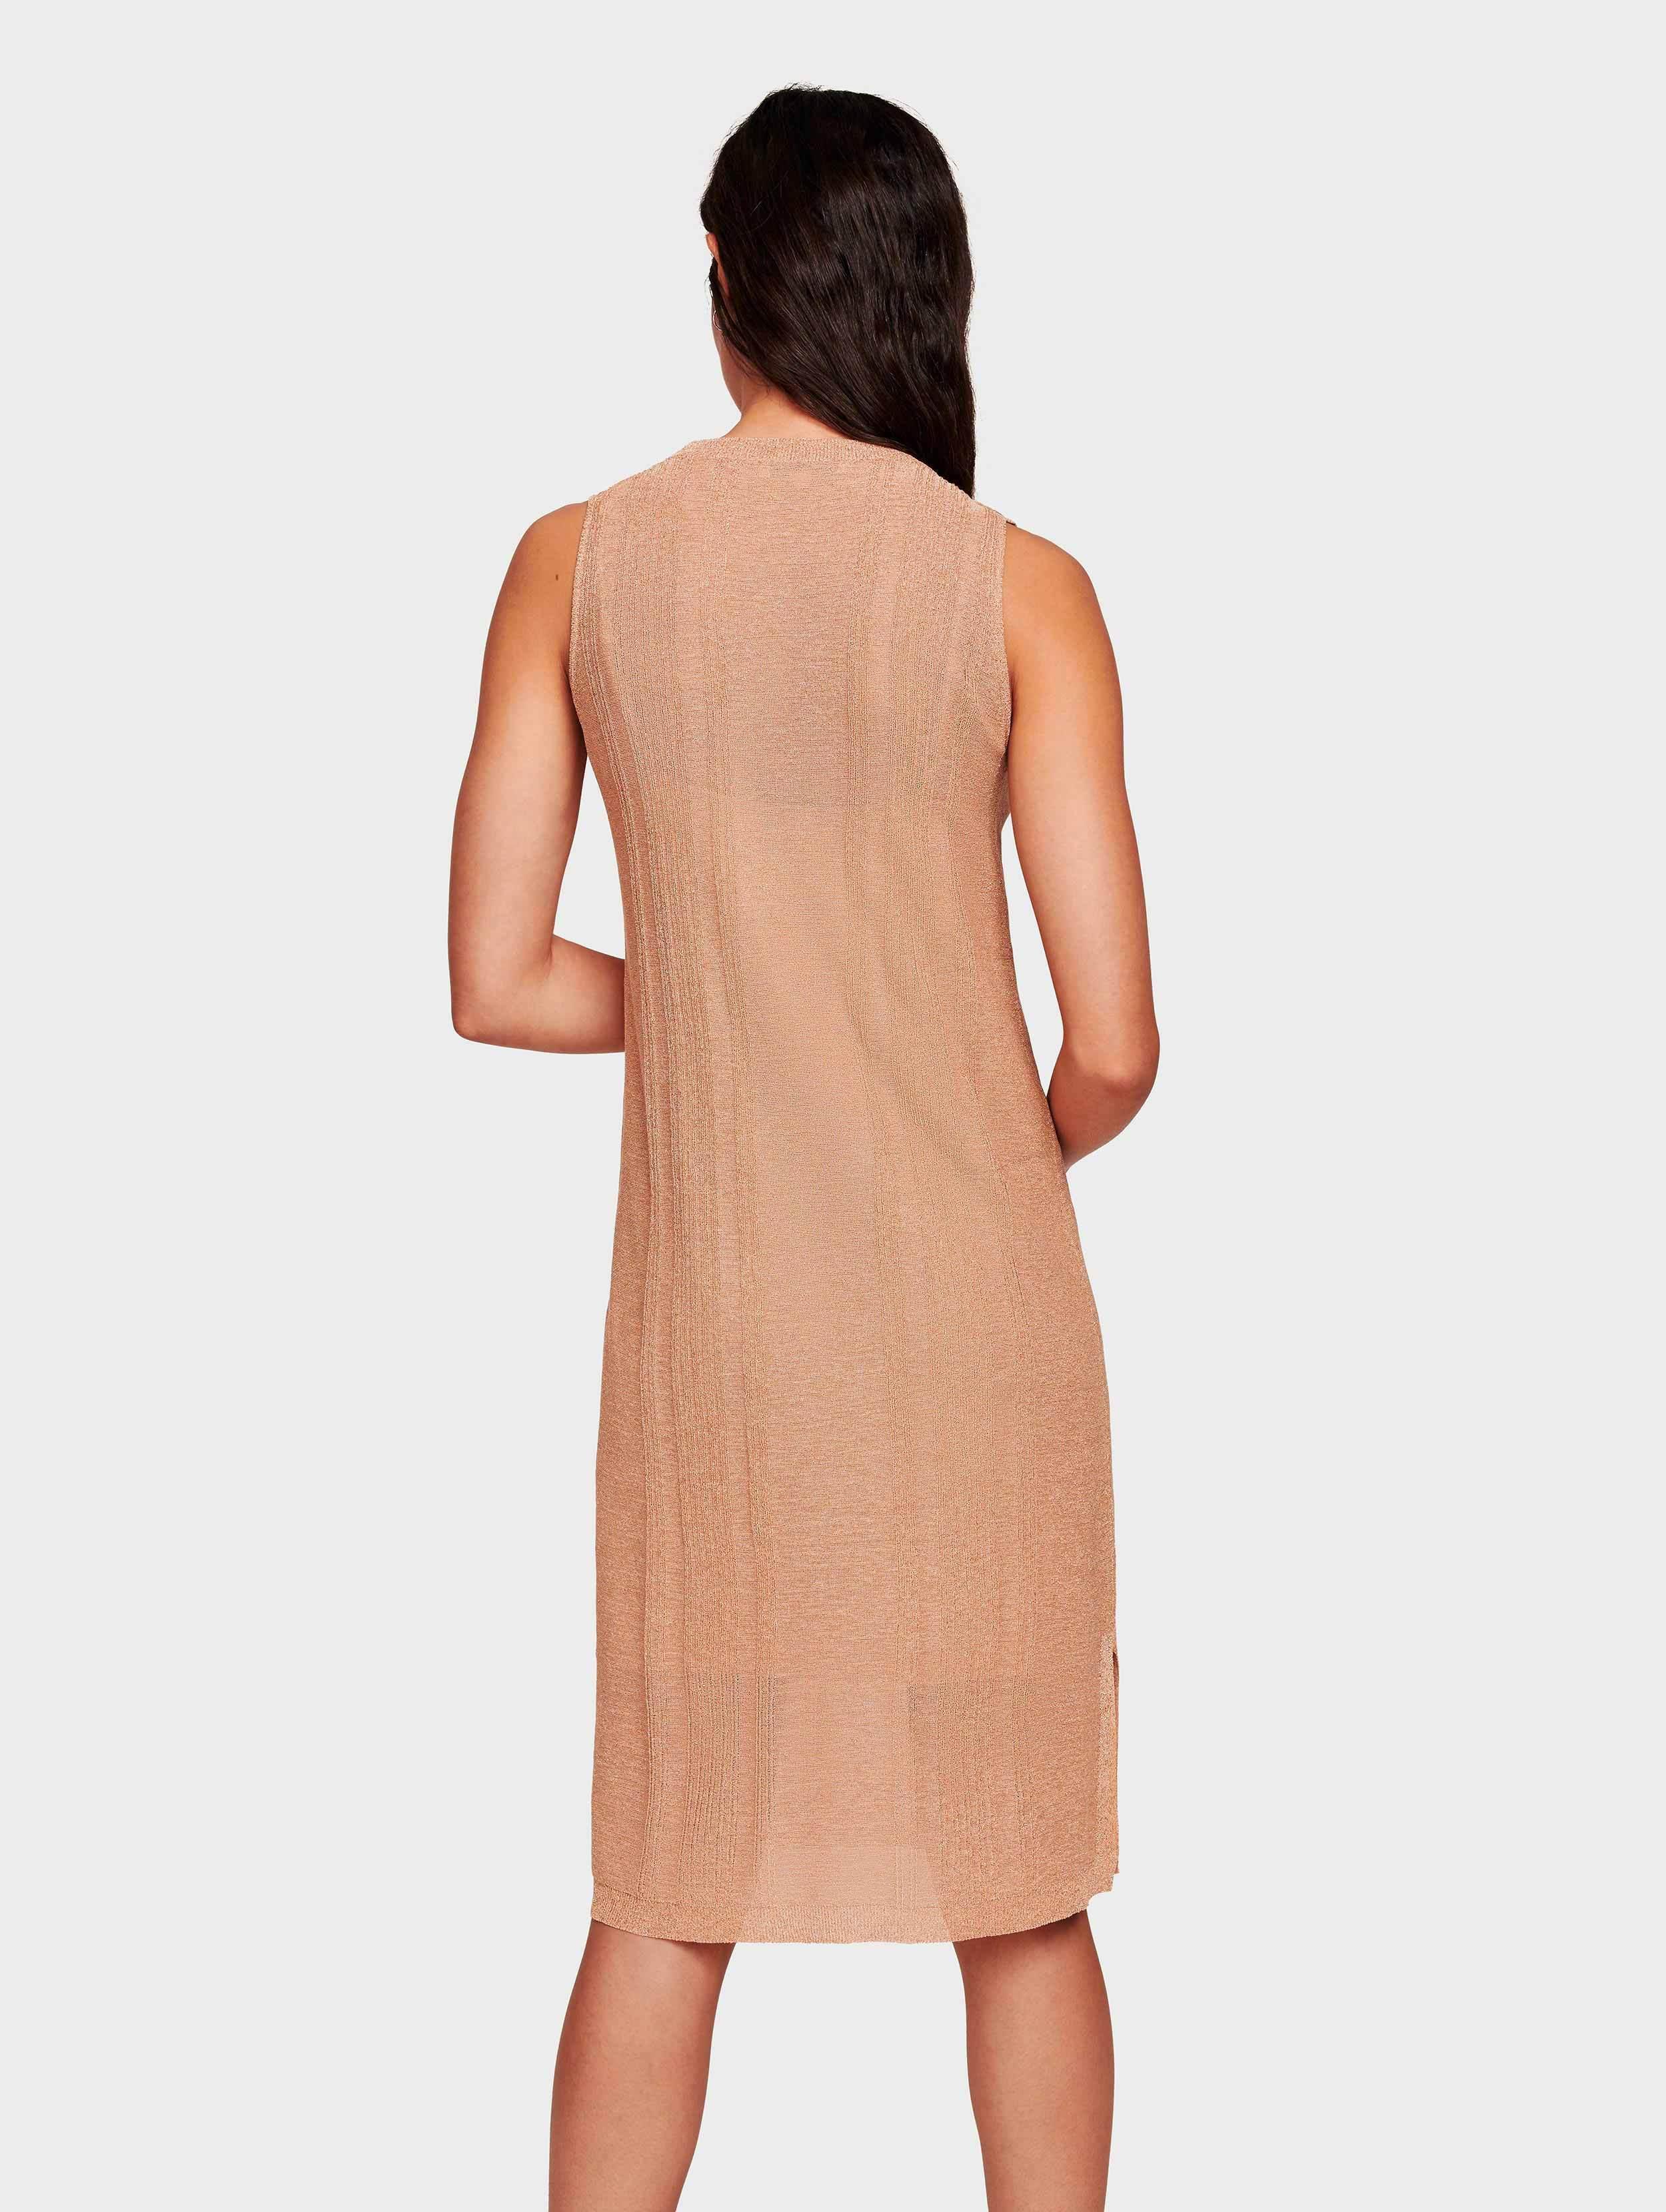 White Warren Synthetic Italian Summer Shine Tank Dress